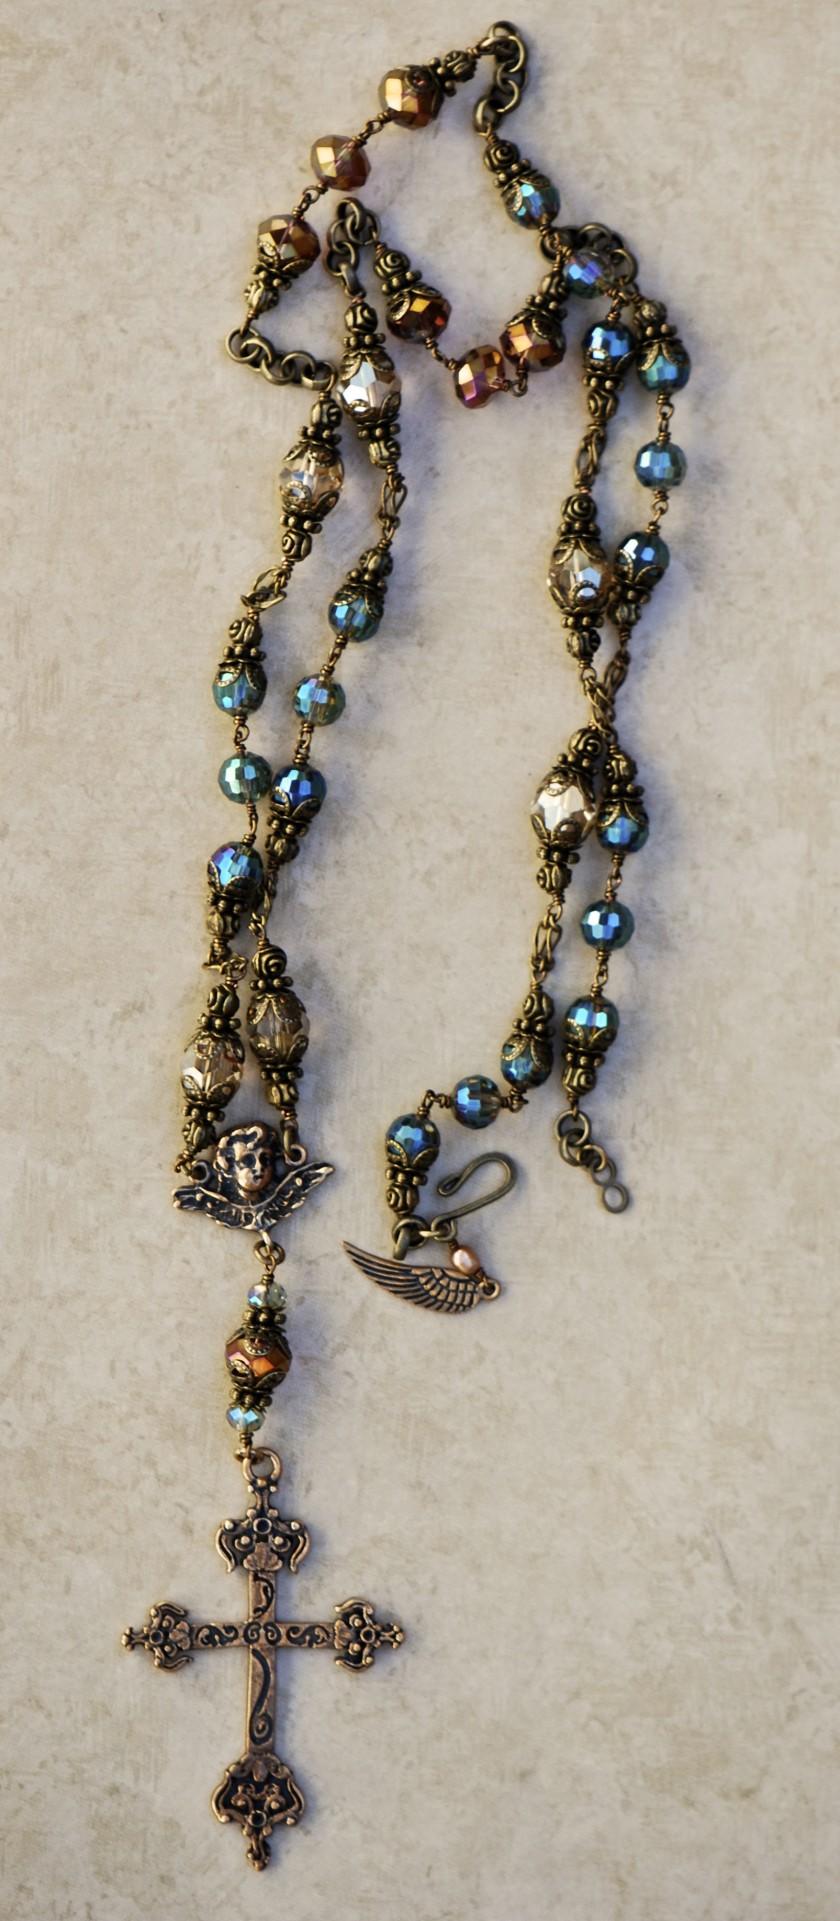 The Seraphym Necklace of Devotion